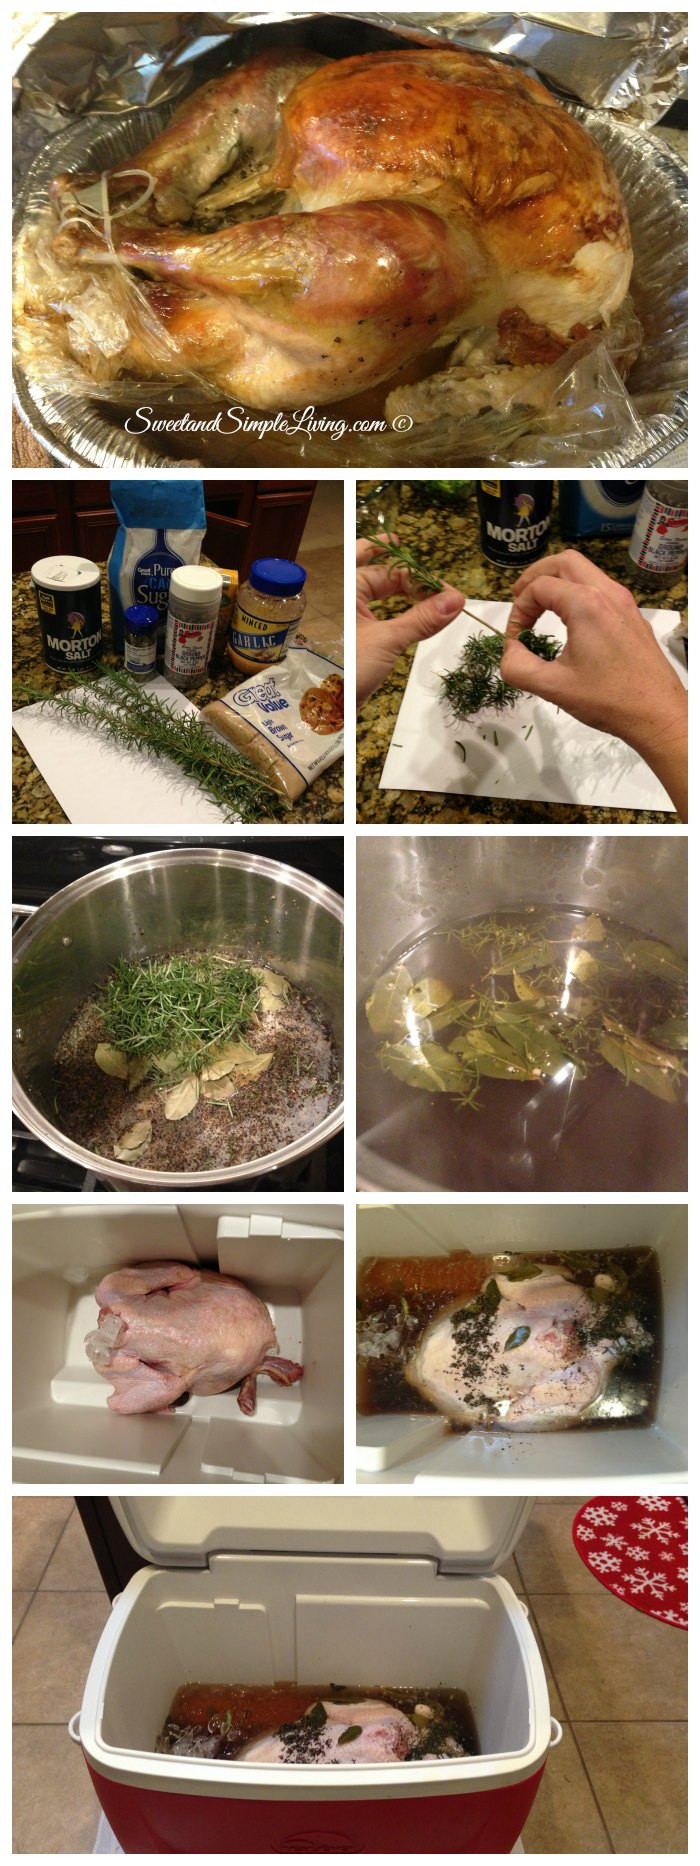 Best Thanksgiving Turkey Recipes  Best Turkey Brine Recipe Sweet and Simple Living